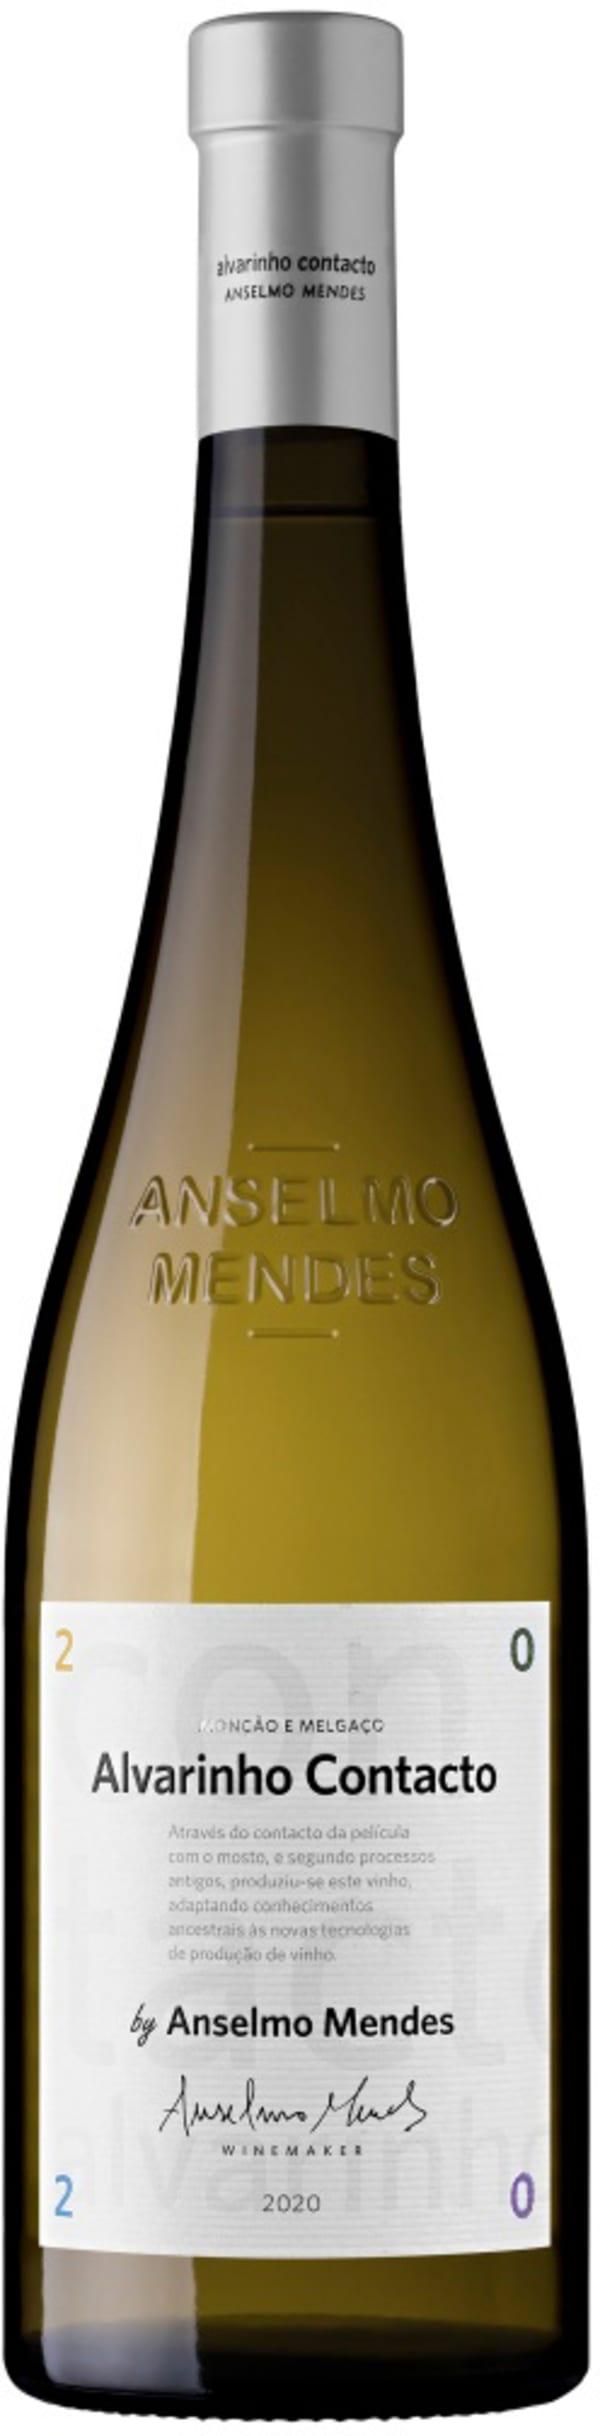 Anselmo Mendes Contacto Alvarinho 2019